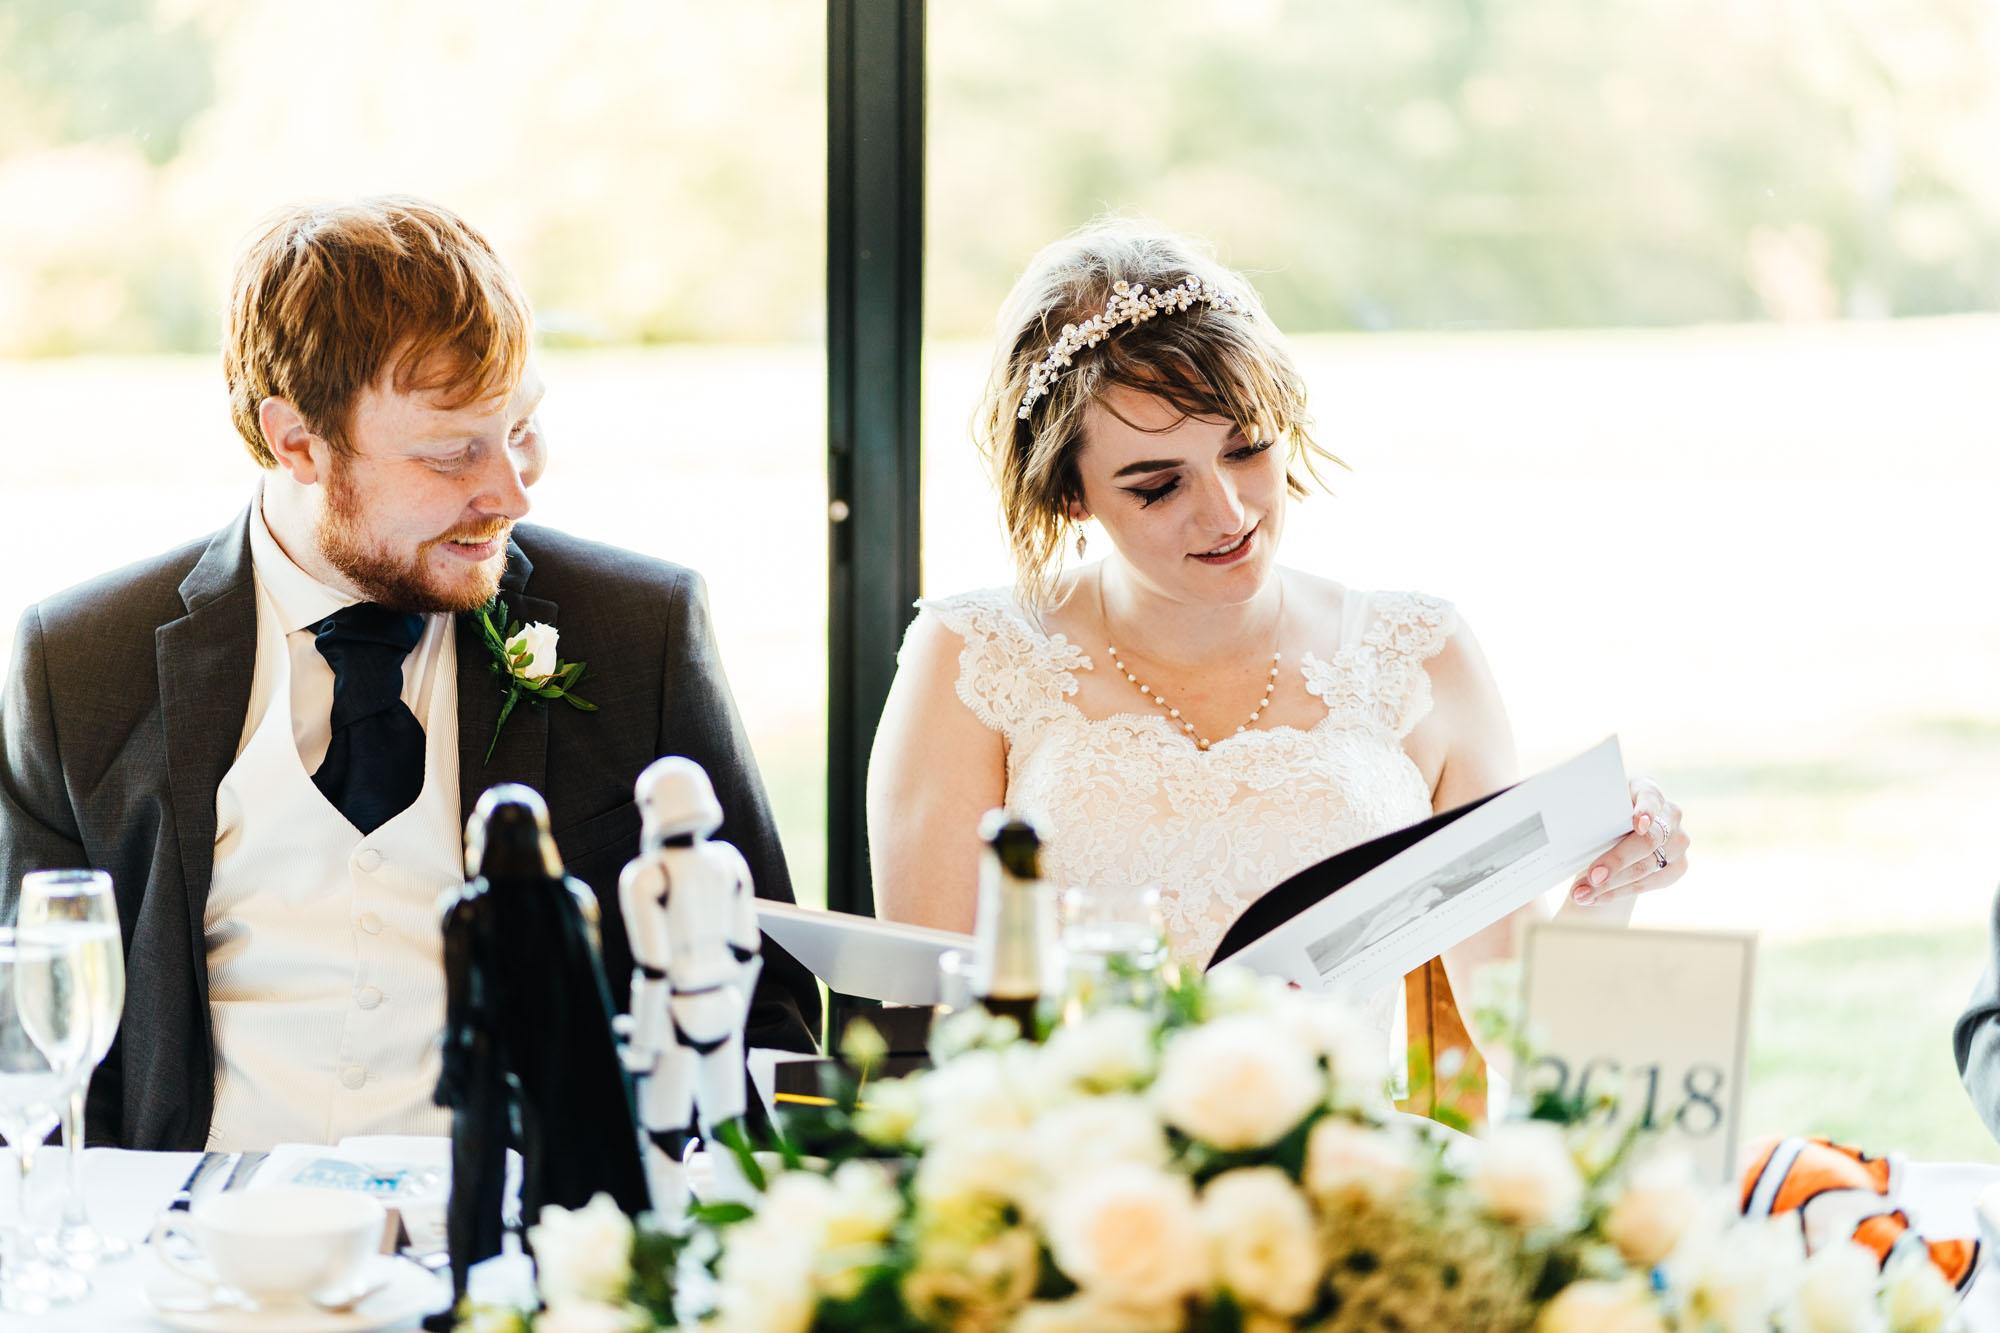 wedding-at-dodford-manor-67